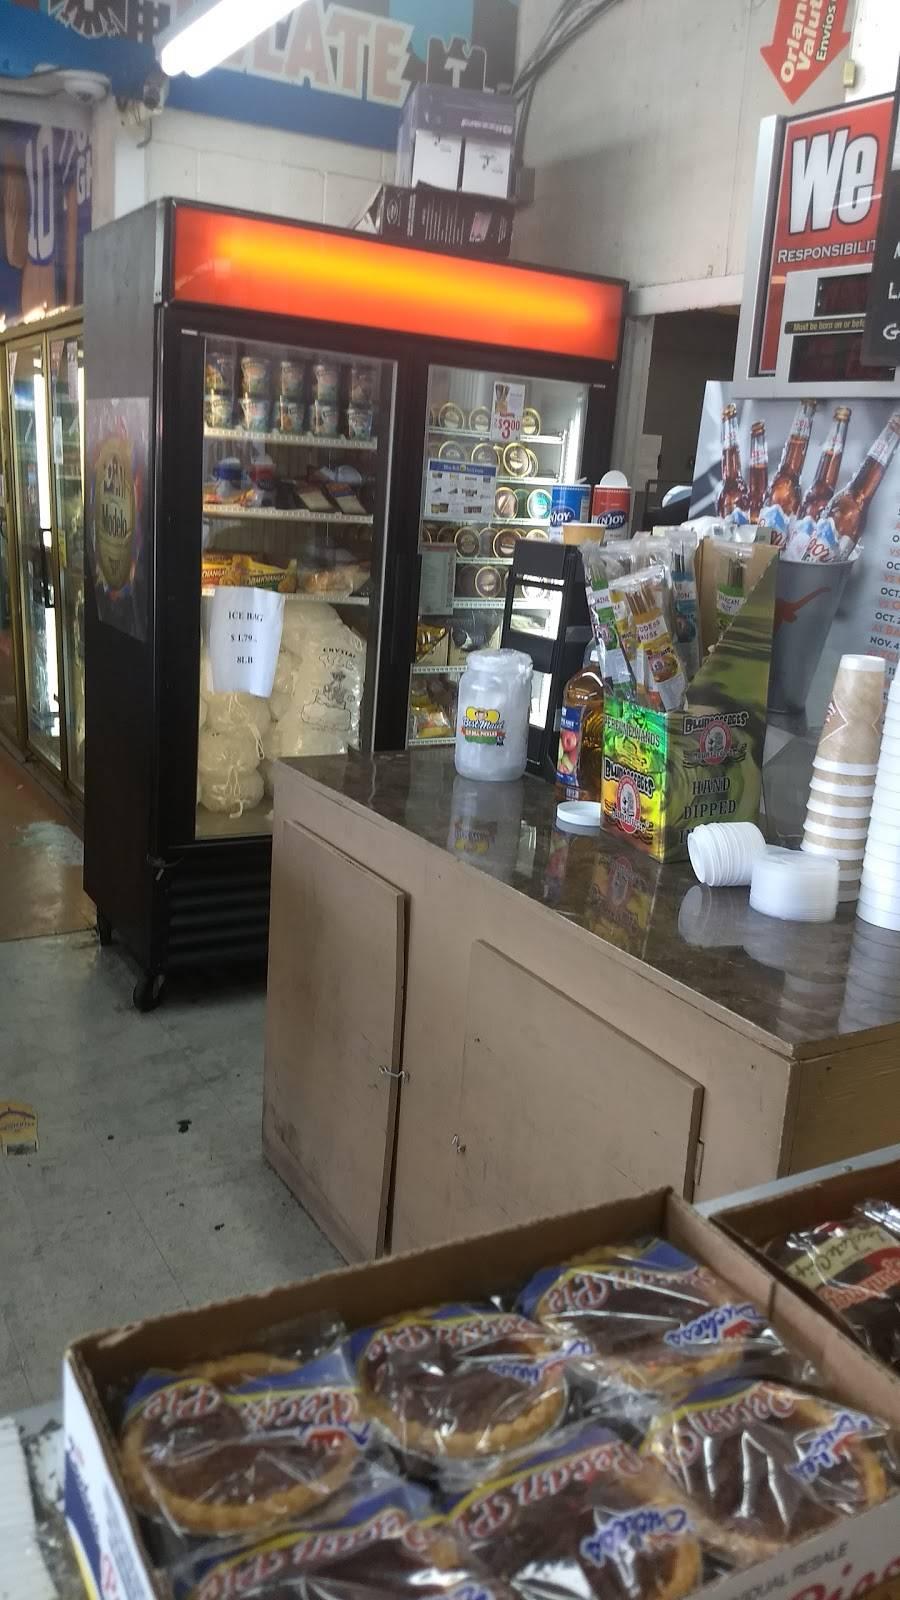 Graboost | restaurant | 4611 E Martin Luther King Jr Blvd, Austin, TX 78721, USA | 5129269553 OR +1 512-926-9553